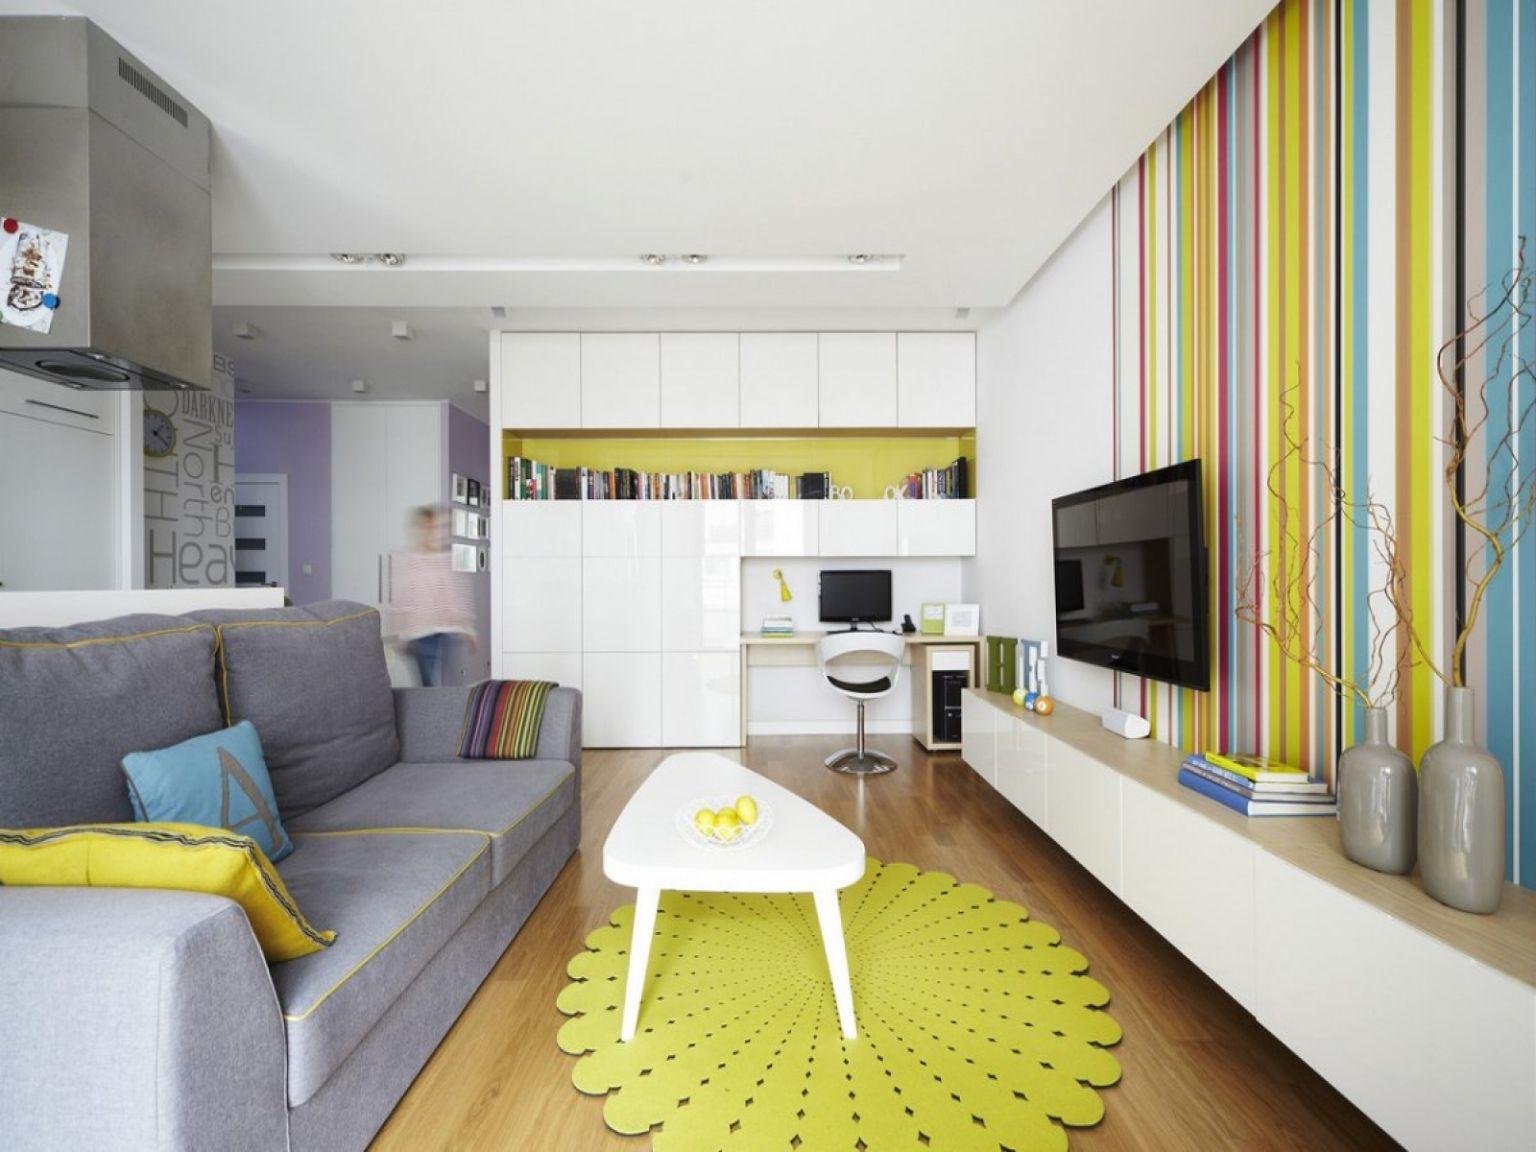 50 Small Living Room Ideas thewowdecor (33)